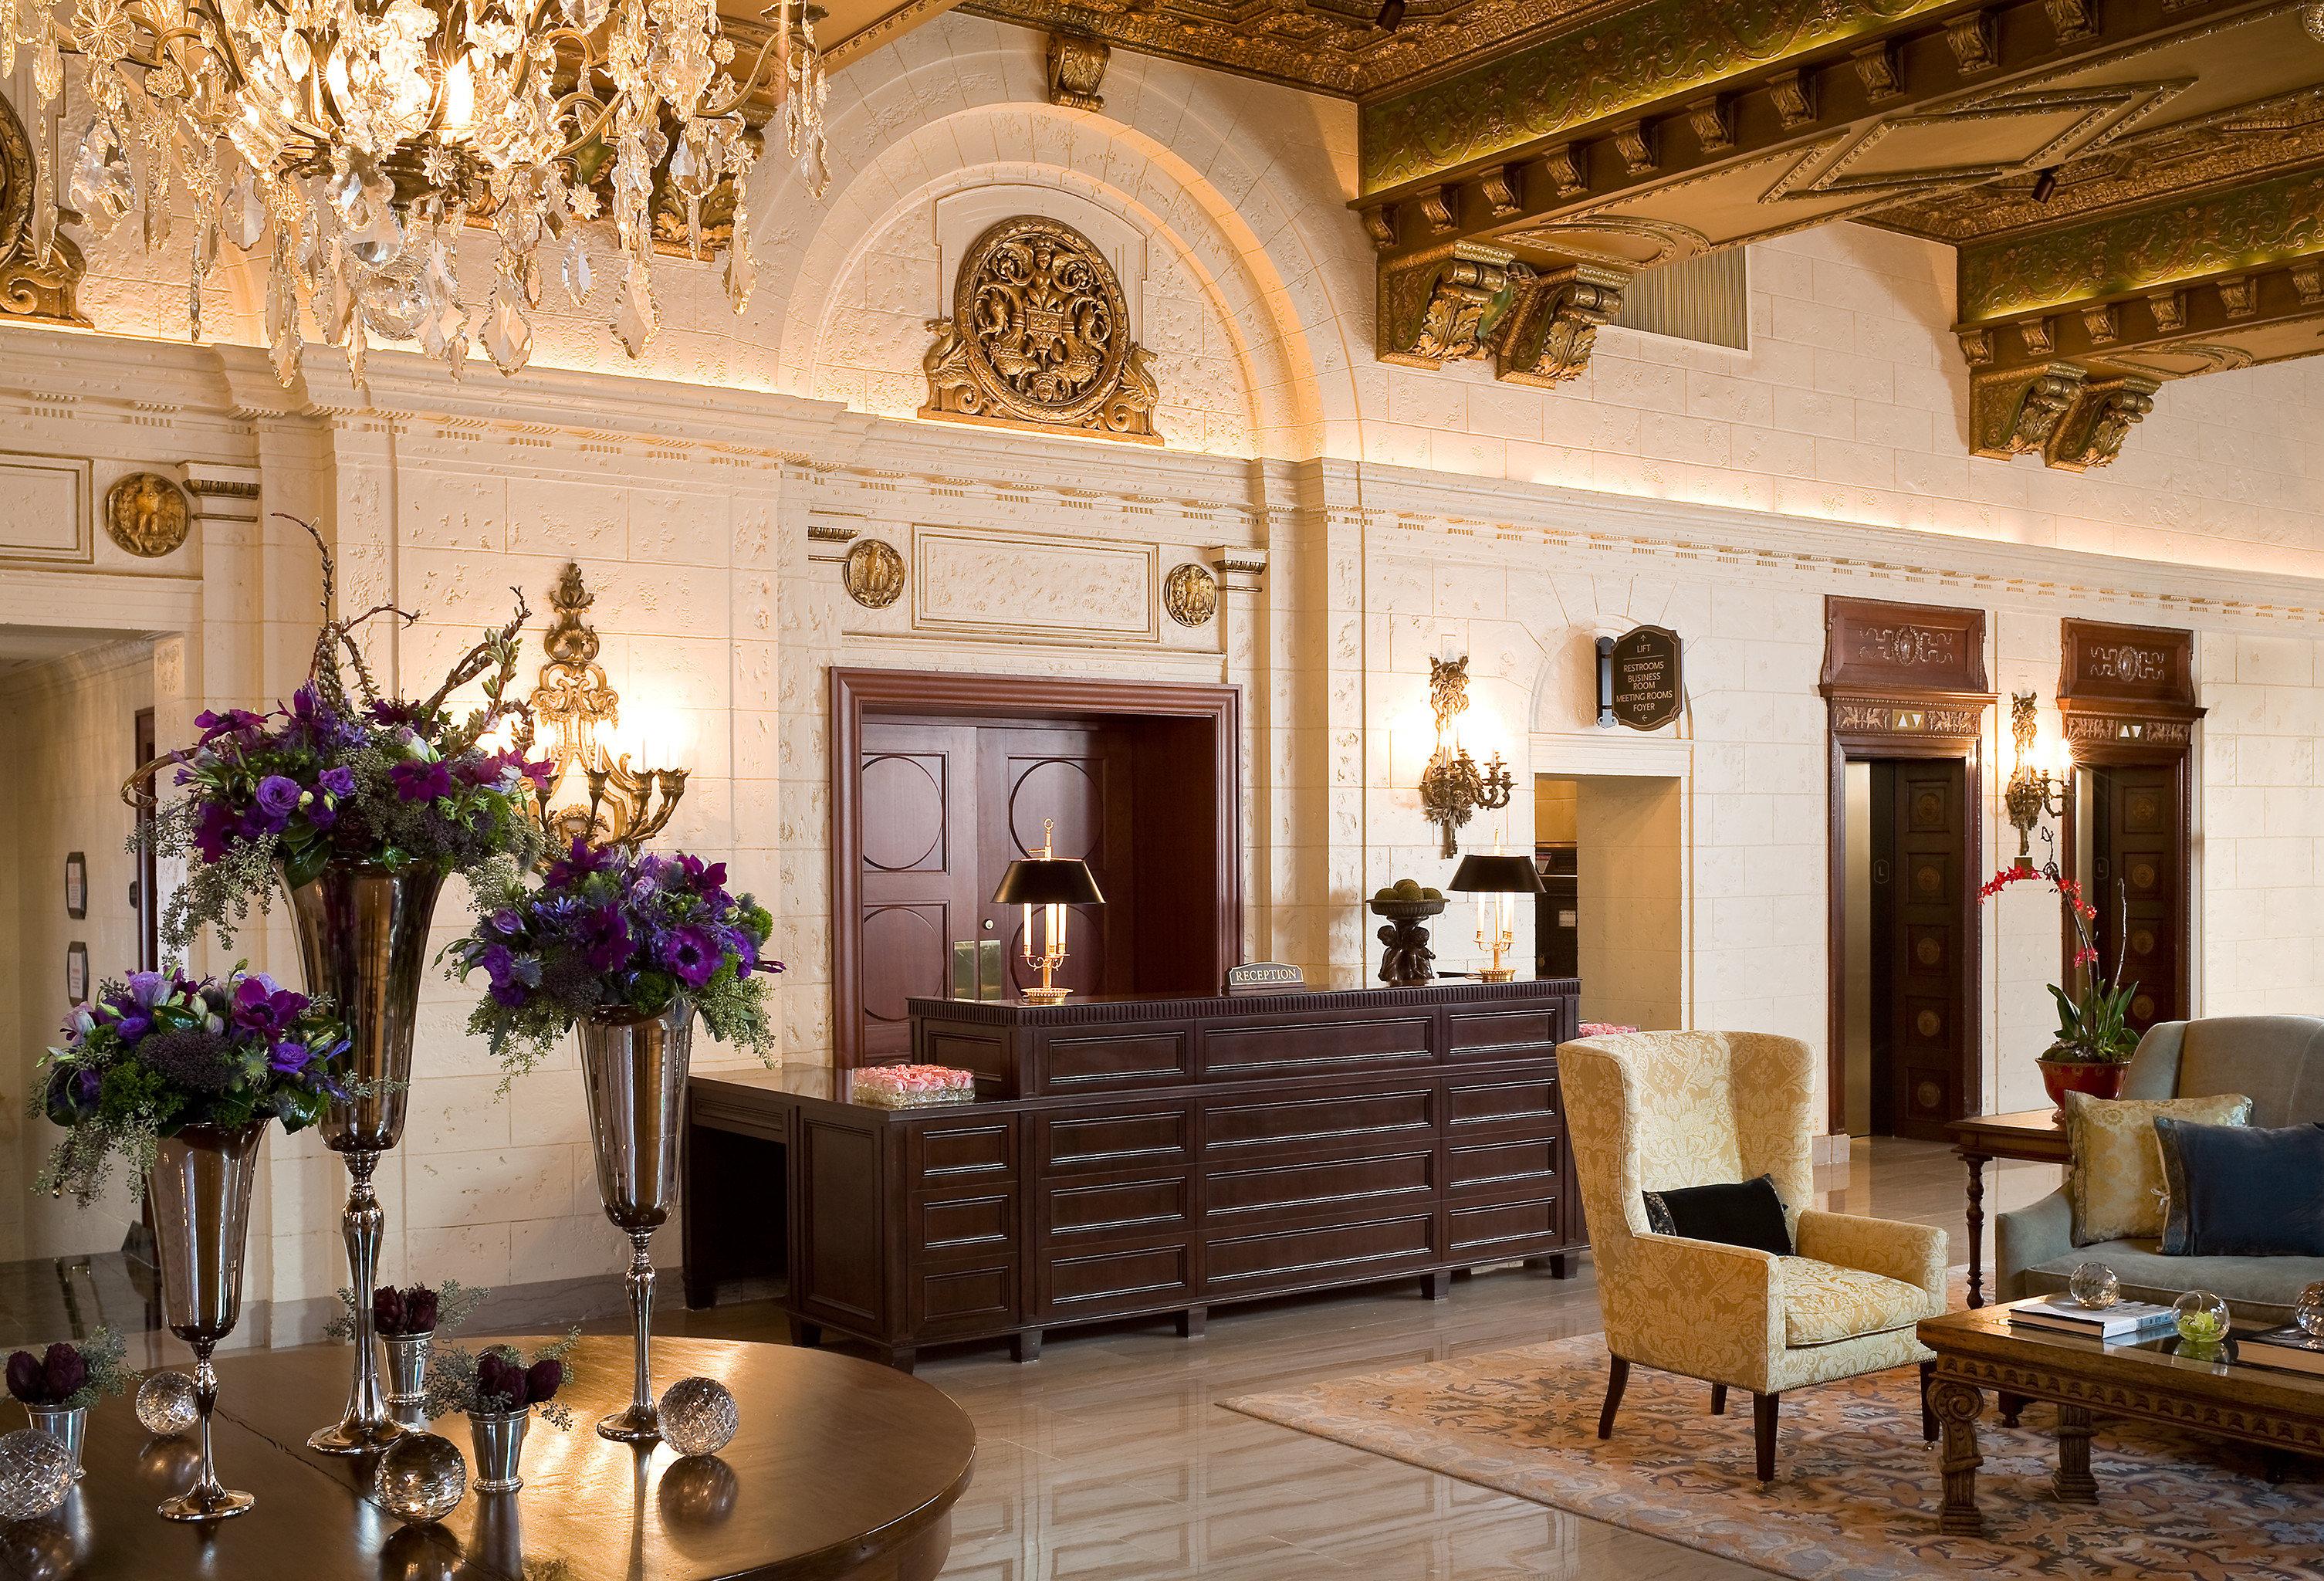 Elegant Fireplace Lounge Lobby living room home mansion palace ballroom